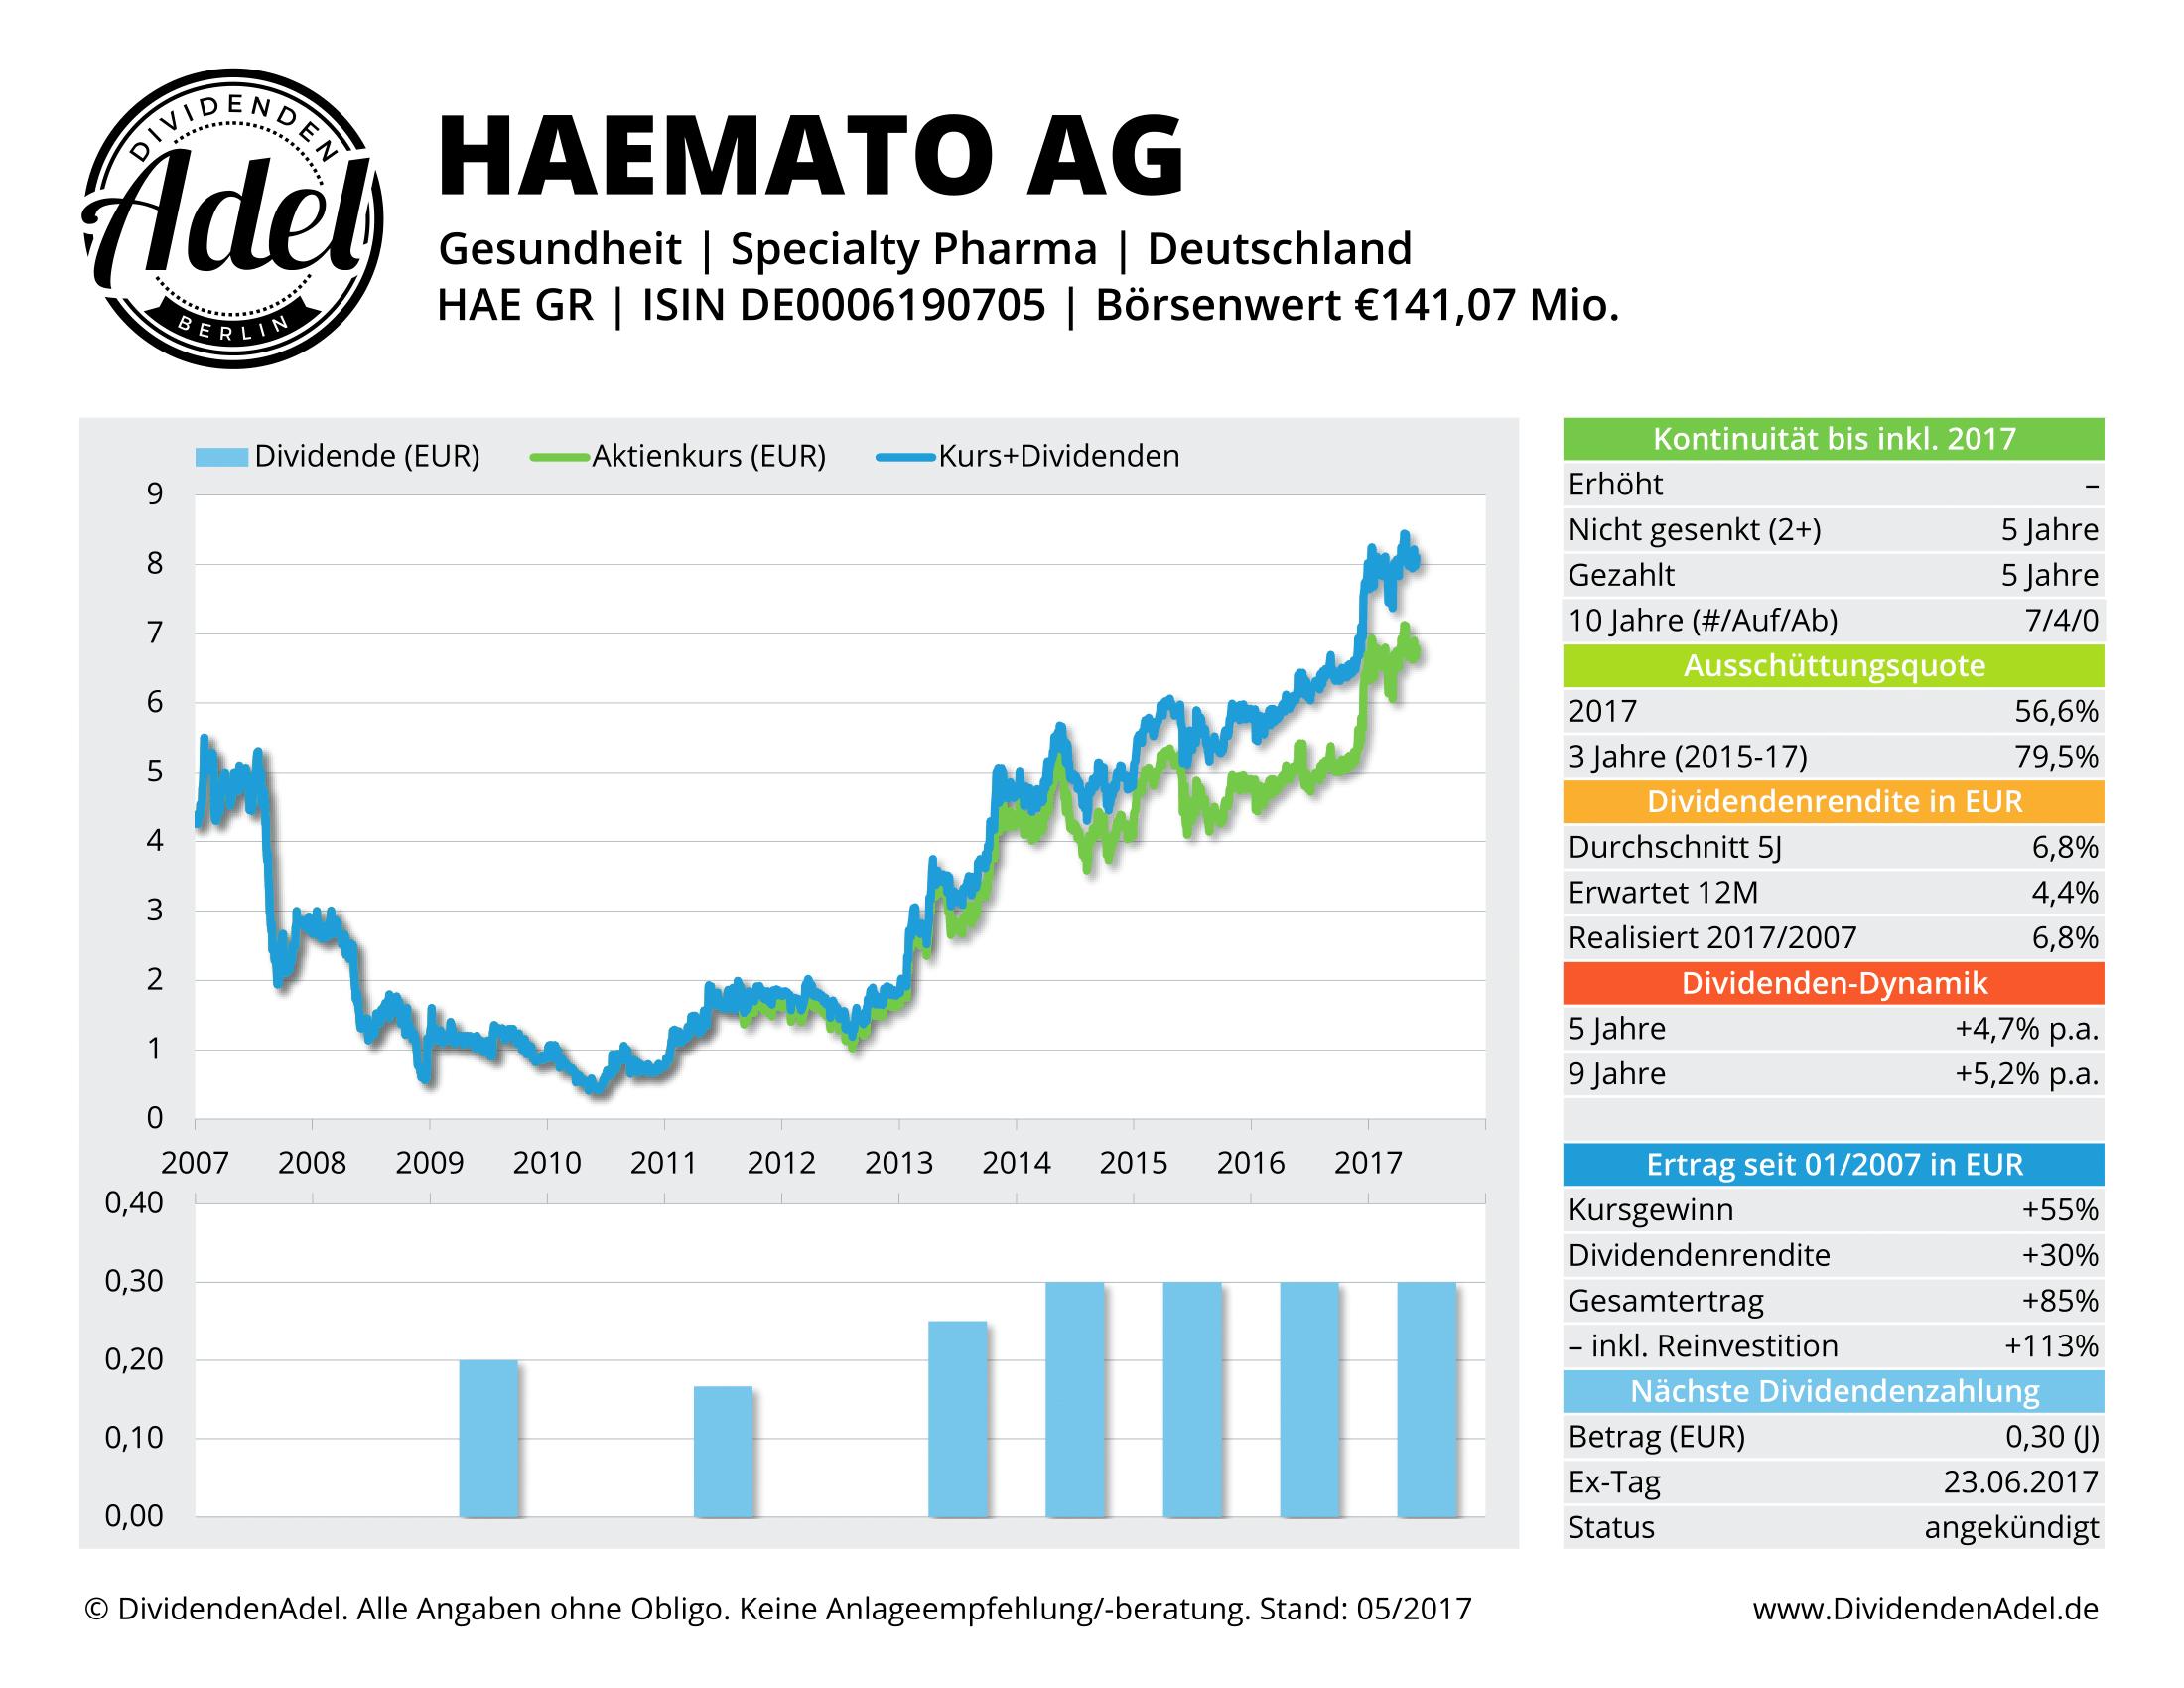 2017-05-30 HAEMATO AG DividendenAdel-Profil ab 2007-1